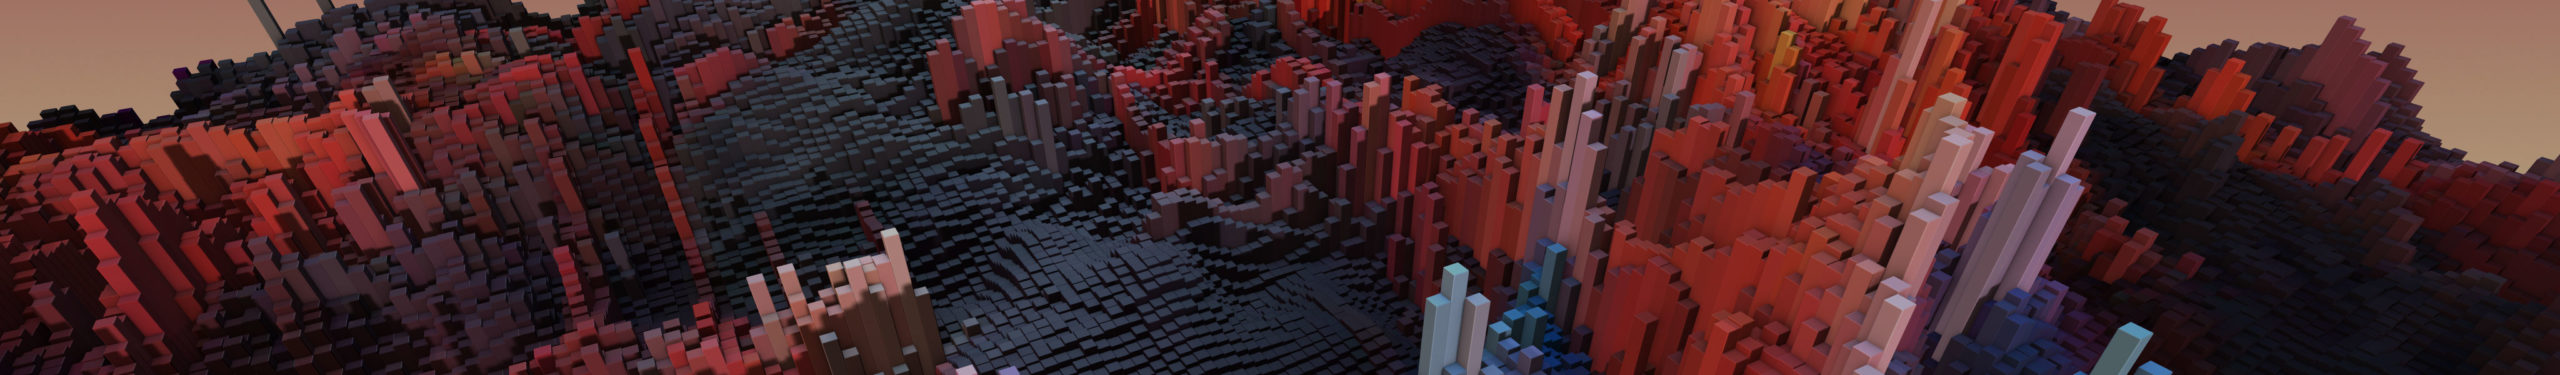 Course Category: 3D VISUALISIERUNGEN